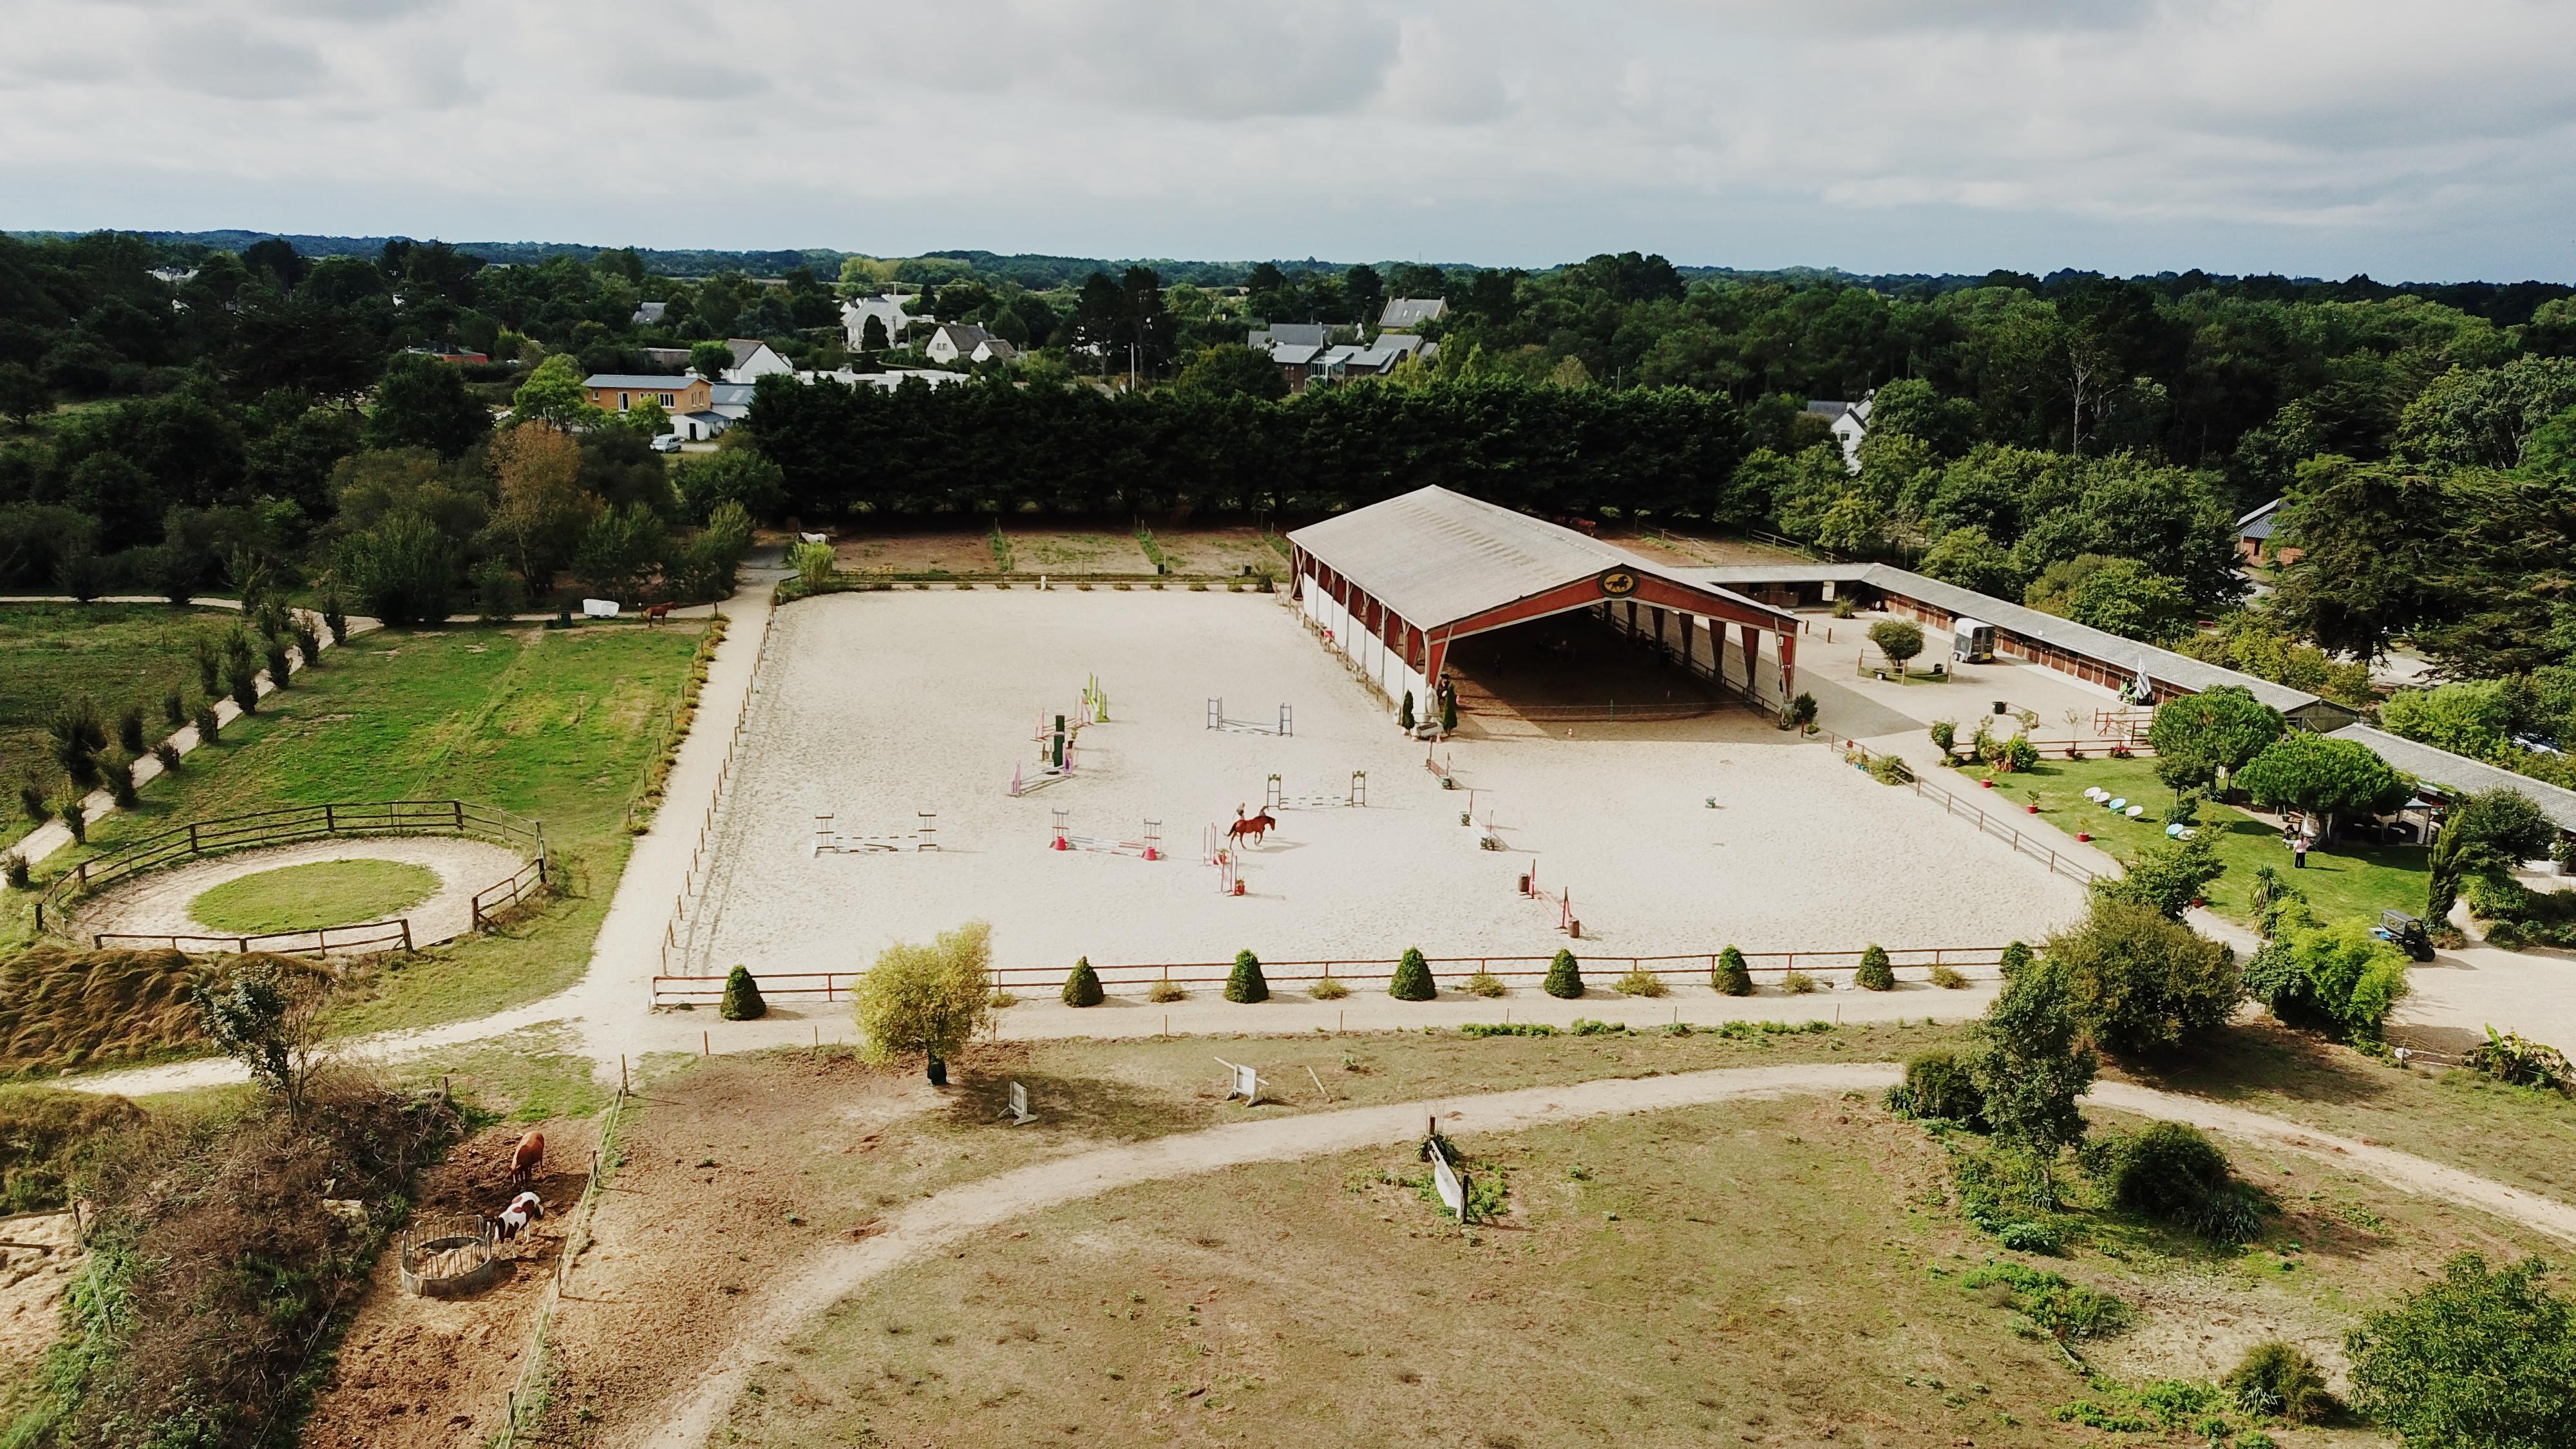 Centre Equestre proche La Baule sur 15 ha (44)